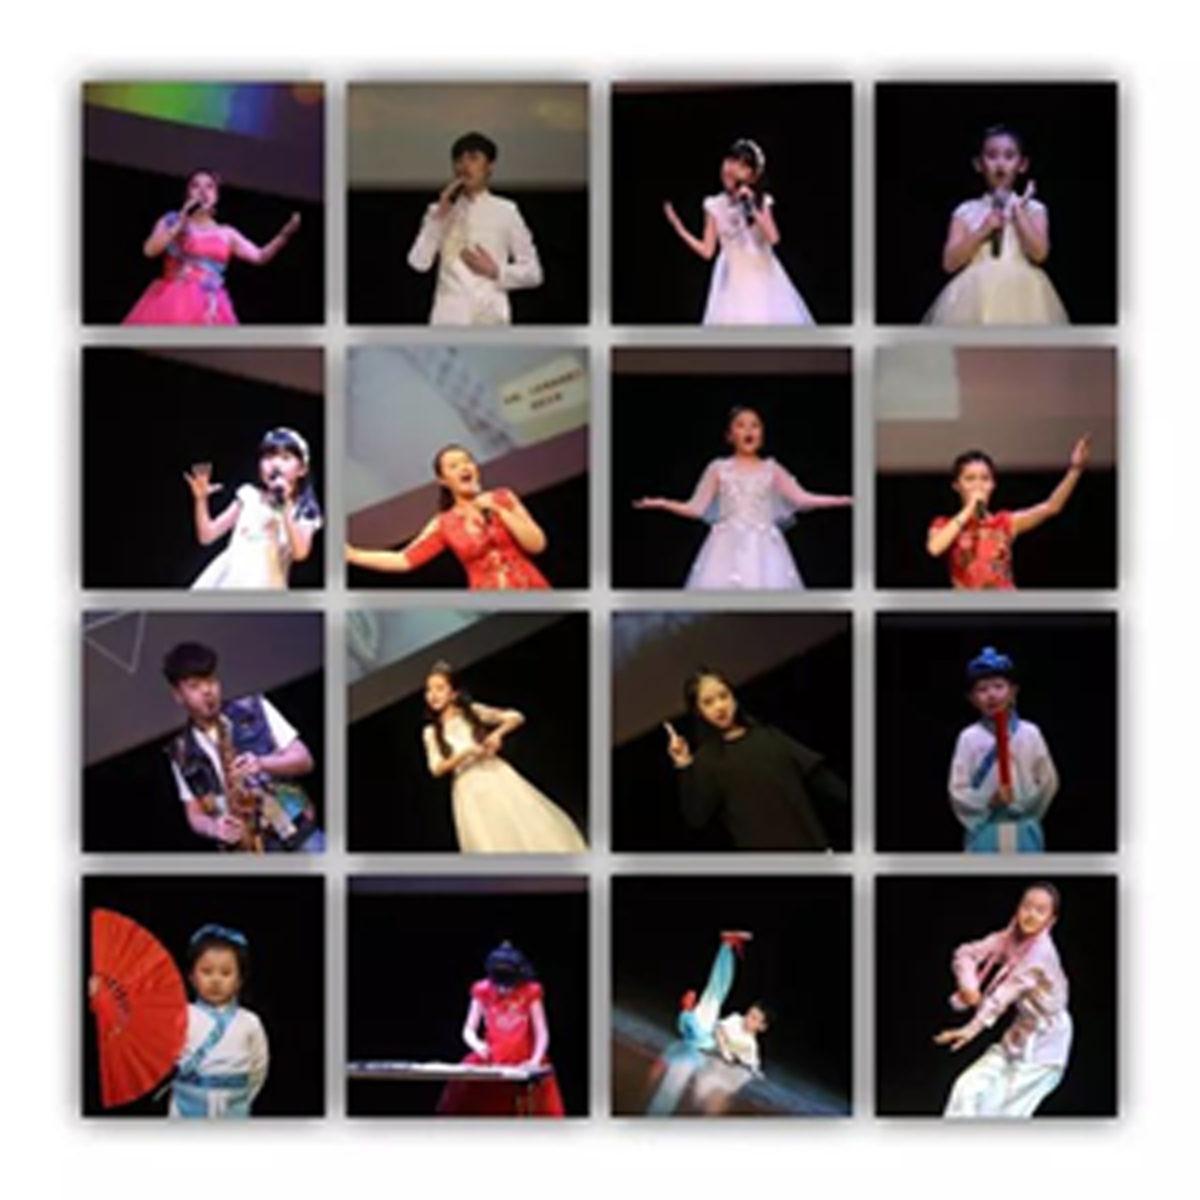 Festival jeunes talents 2018